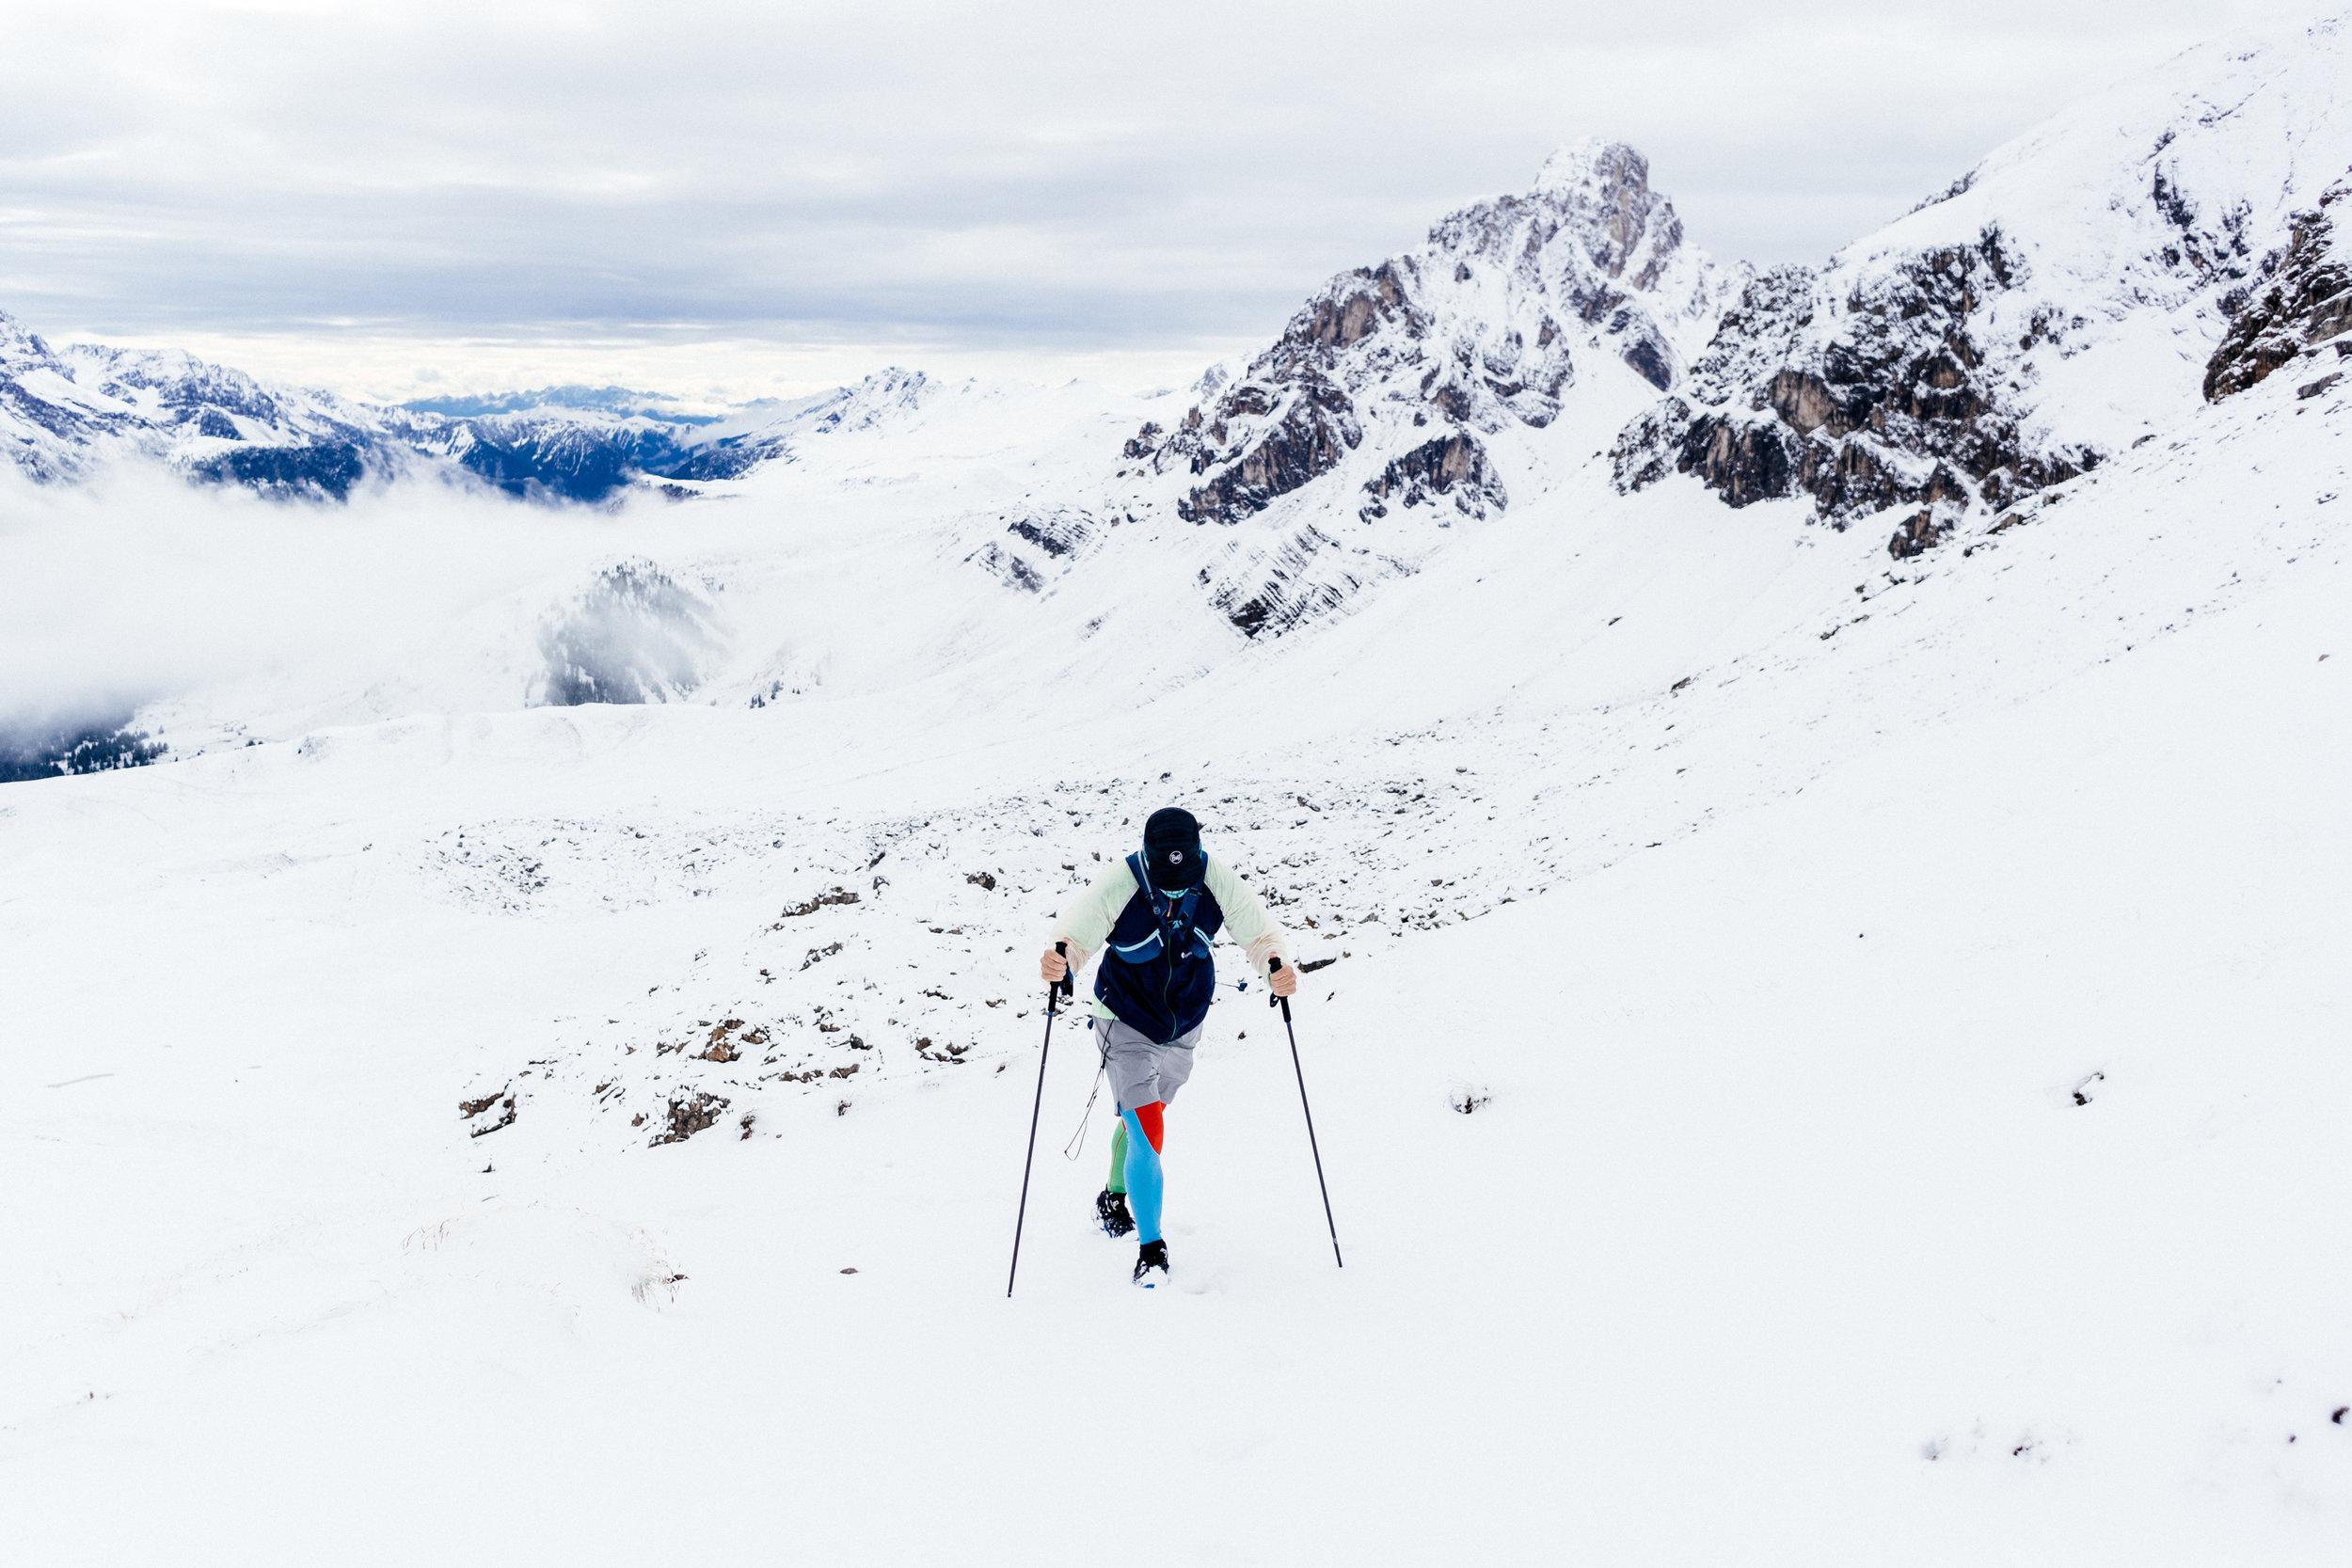 Dolomites-ChrisBrinleeJr-SEP17-84.jpg